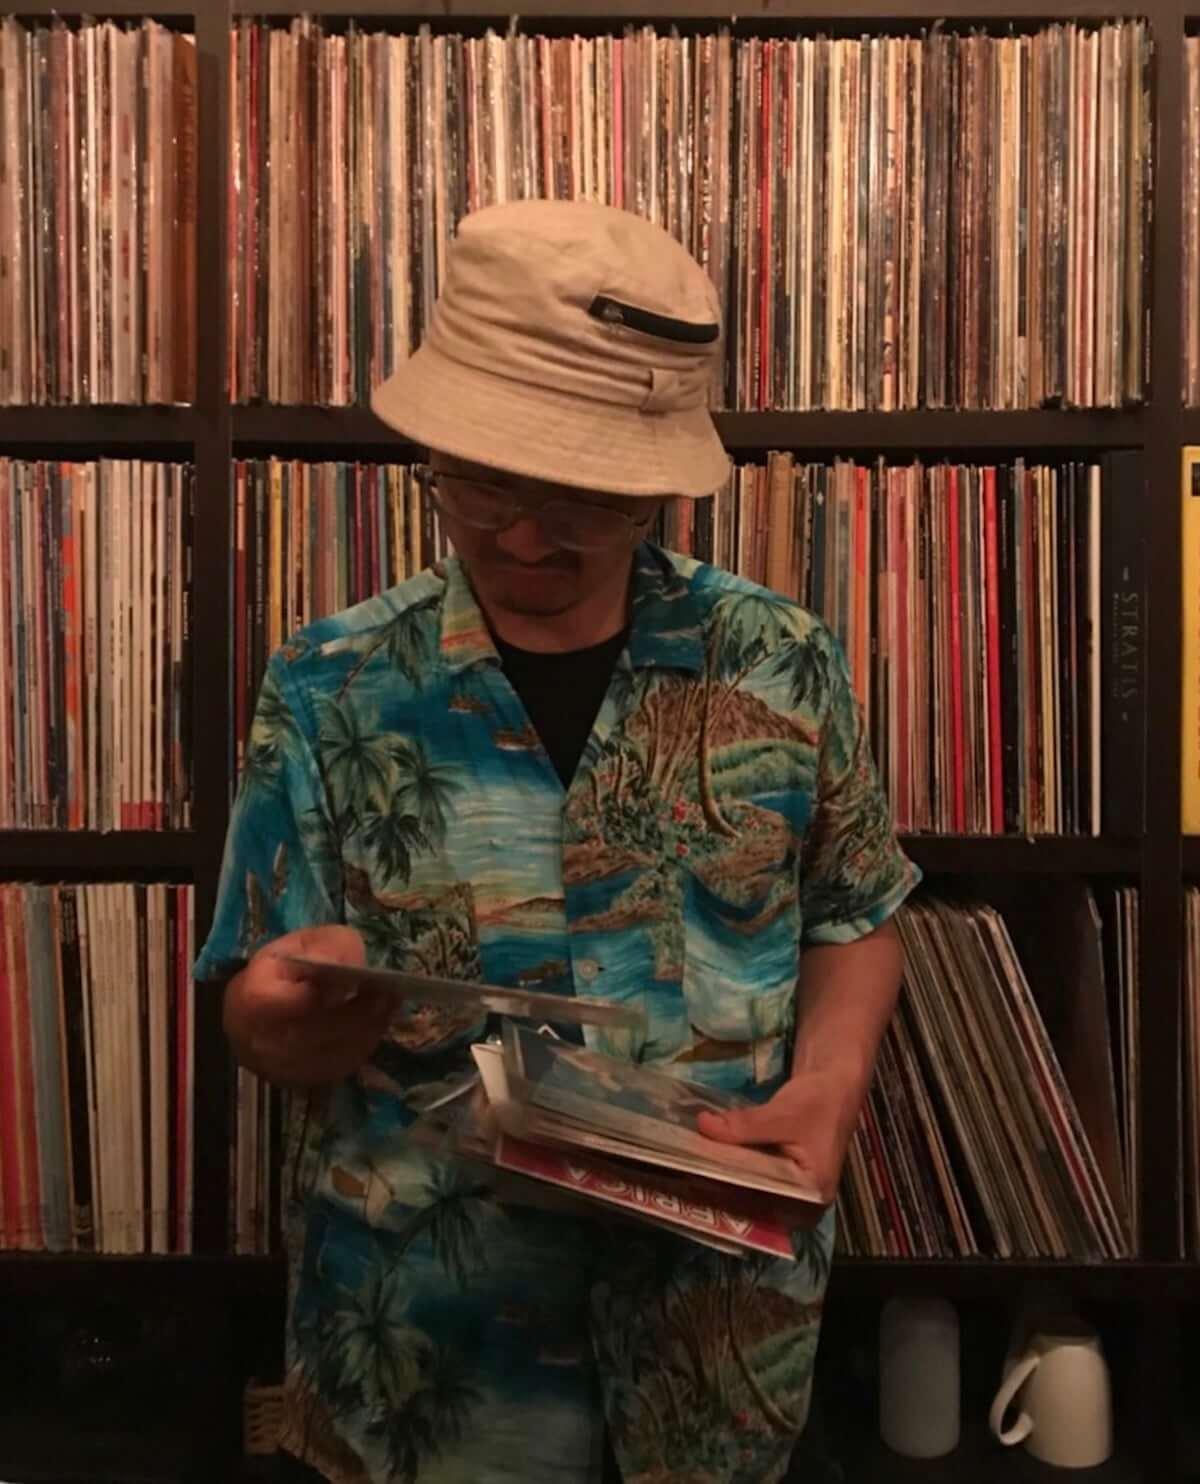 DJ KOCOによる初ラウンジDJイベント<Shimokita Lounge>が開催!スペシャルゲストにハウス/ディスコ界のレジェンド DJ Noriが出演! music180928_shimokita_lounge_03-1200x1484